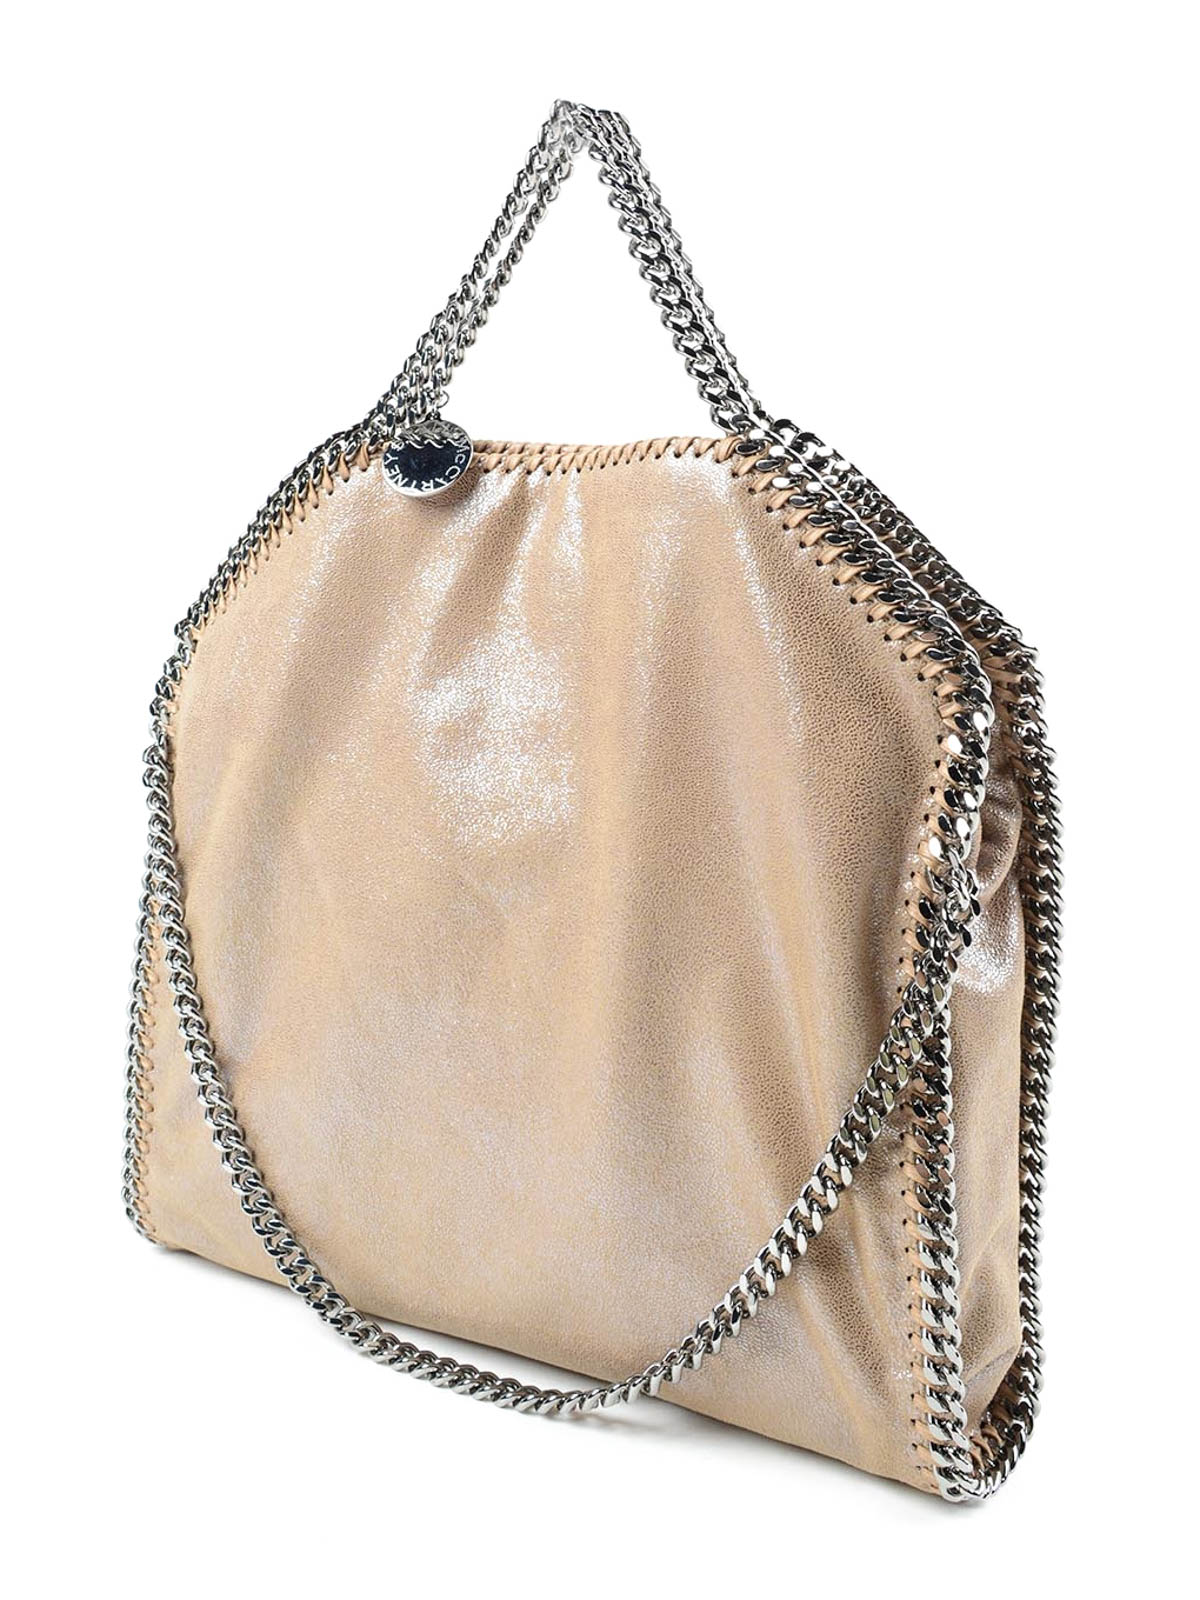 falabella fold over bag by stella mccartney totes bags shop online at. Black Bedroom Furniture Sets. Home Design Ideas